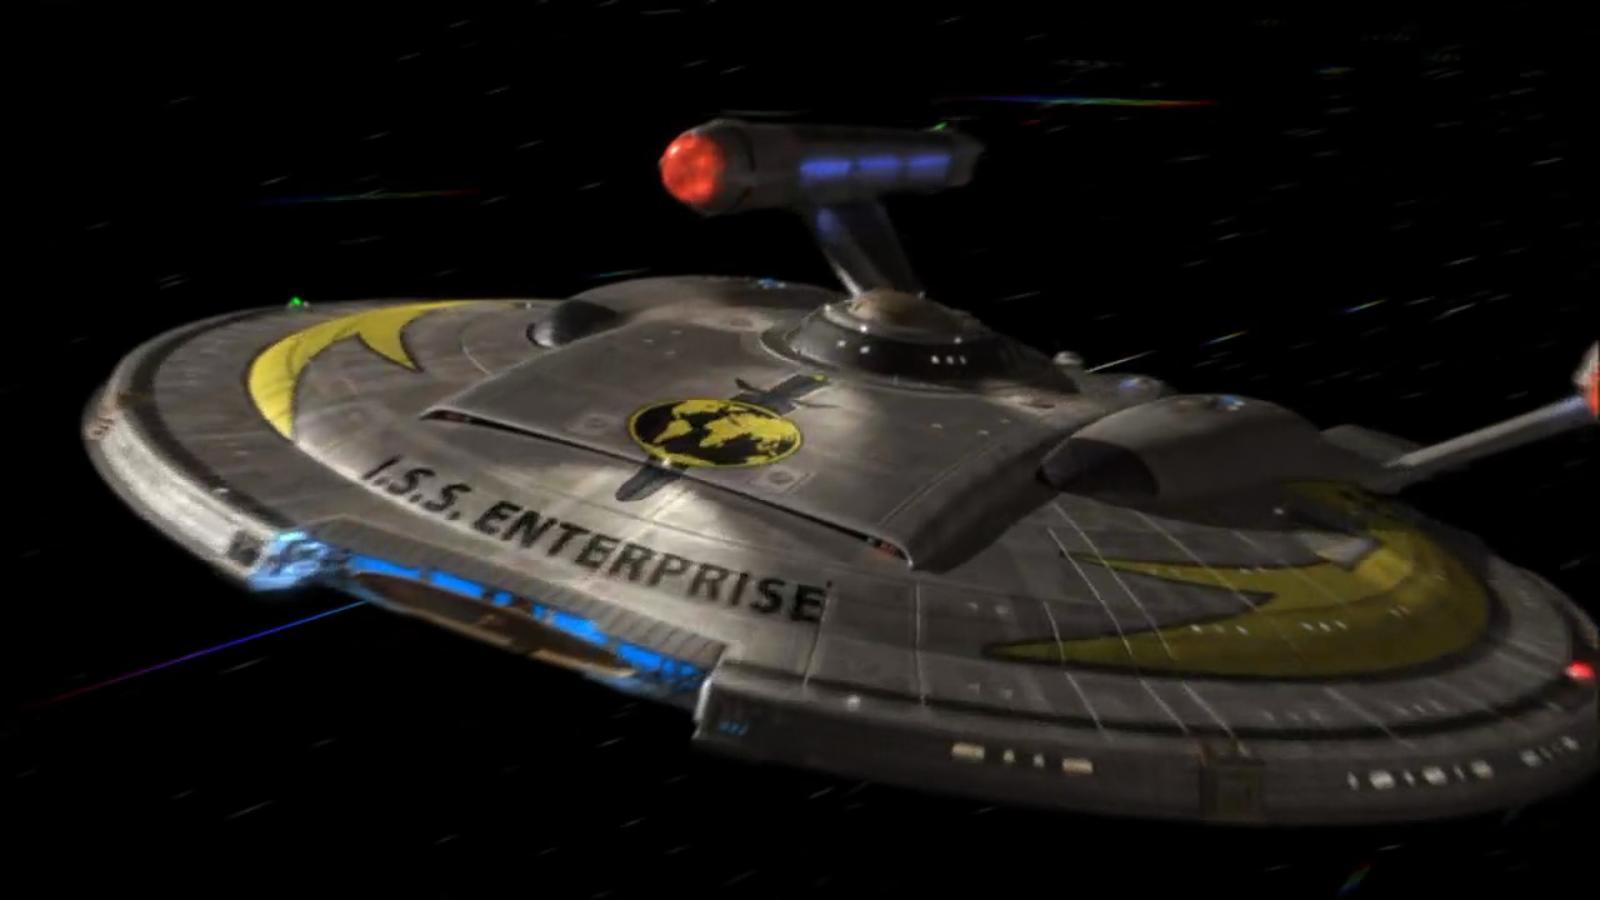 Enterprise Season 5 Mirror Universe